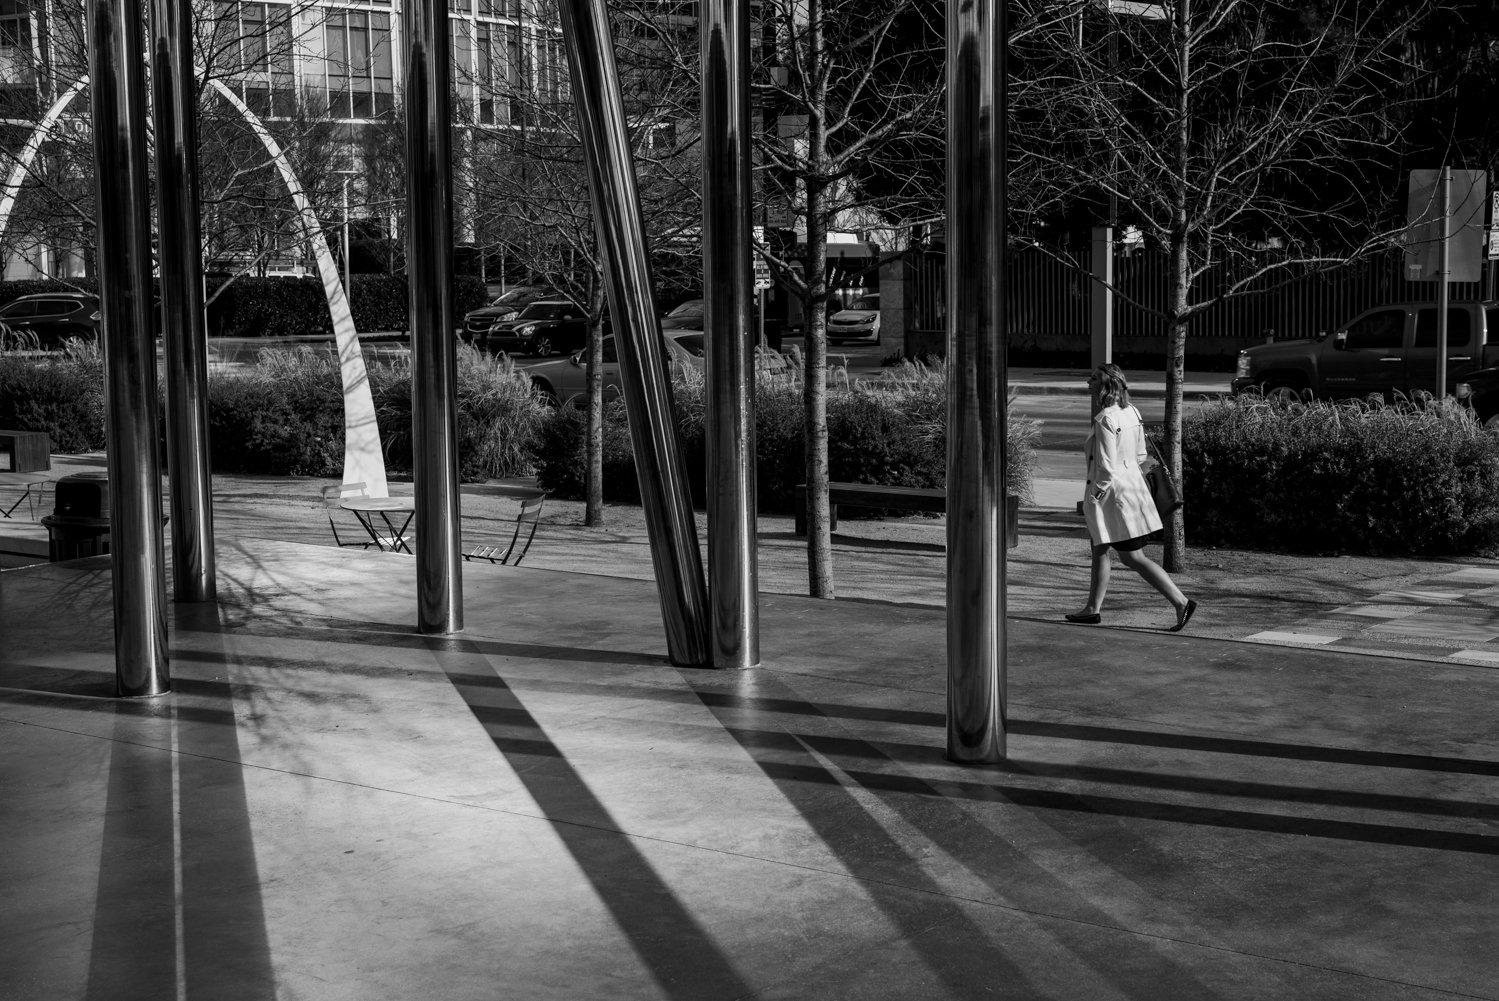 USA ROADTRIP TRAVEL PHOTOGRAPHY-93